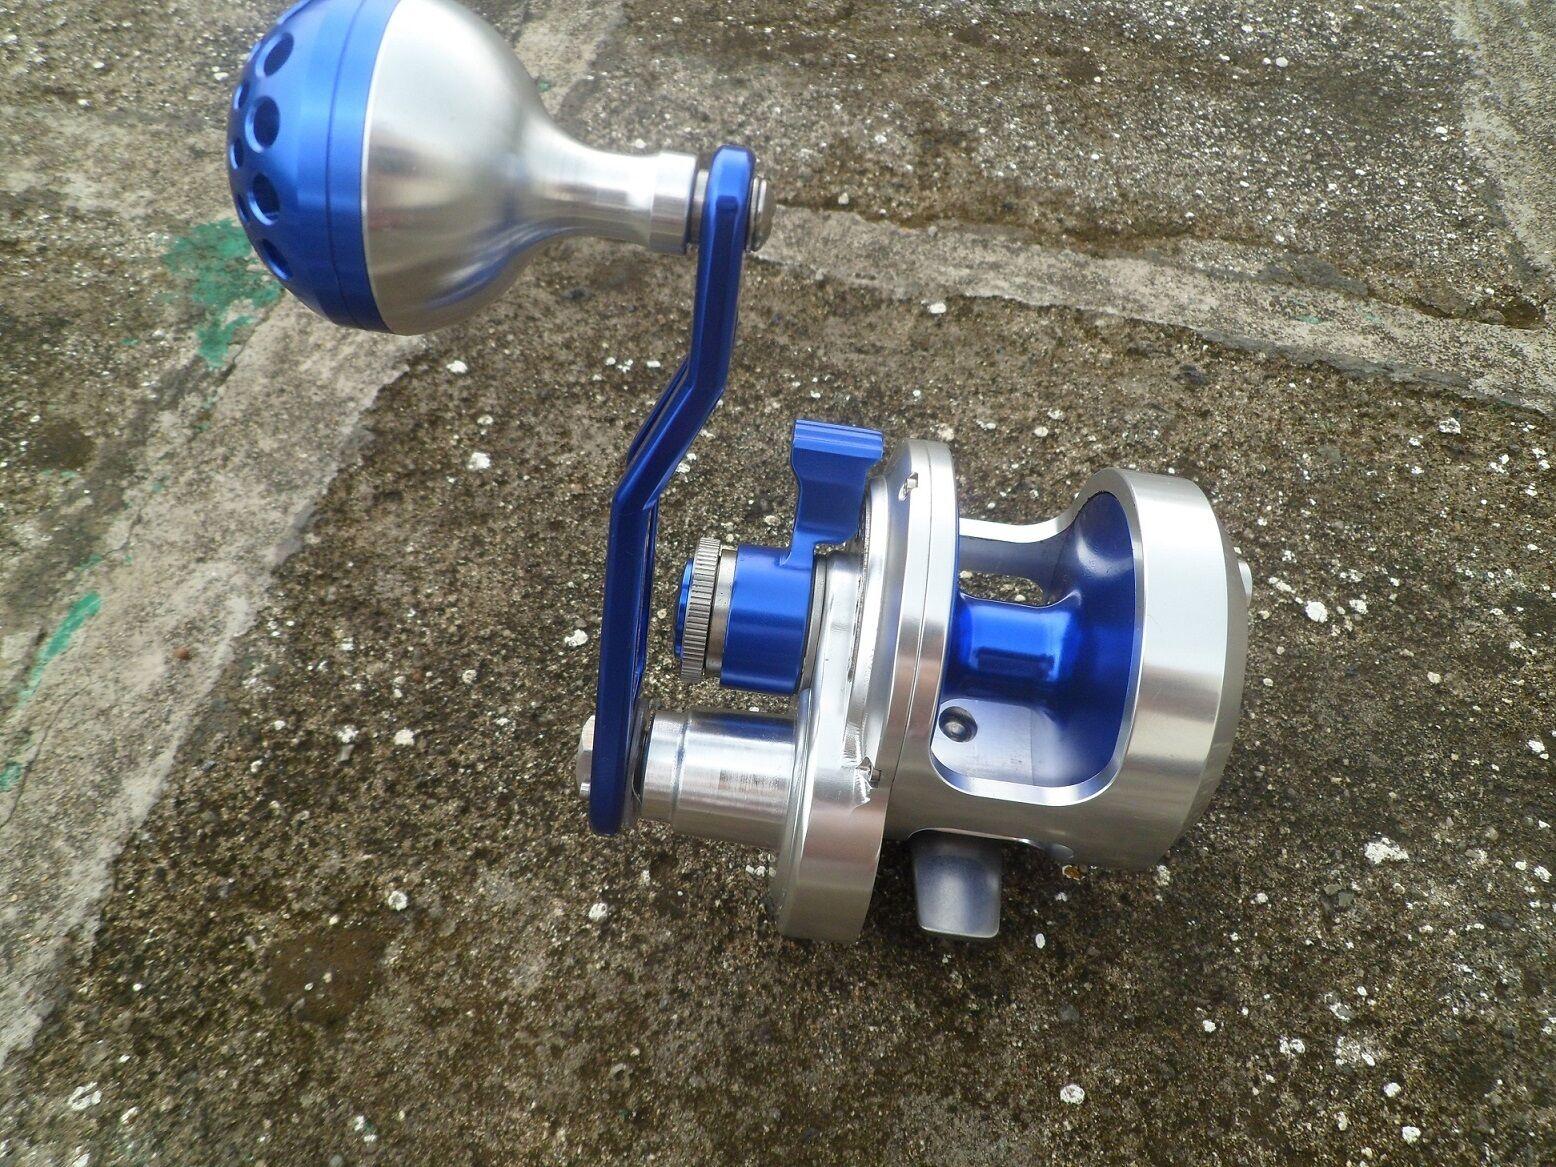 Saltwater  Overhead Jigging Fishing Reel Full Metal Manufacturing 8+2BB PE3  on sale 70% off